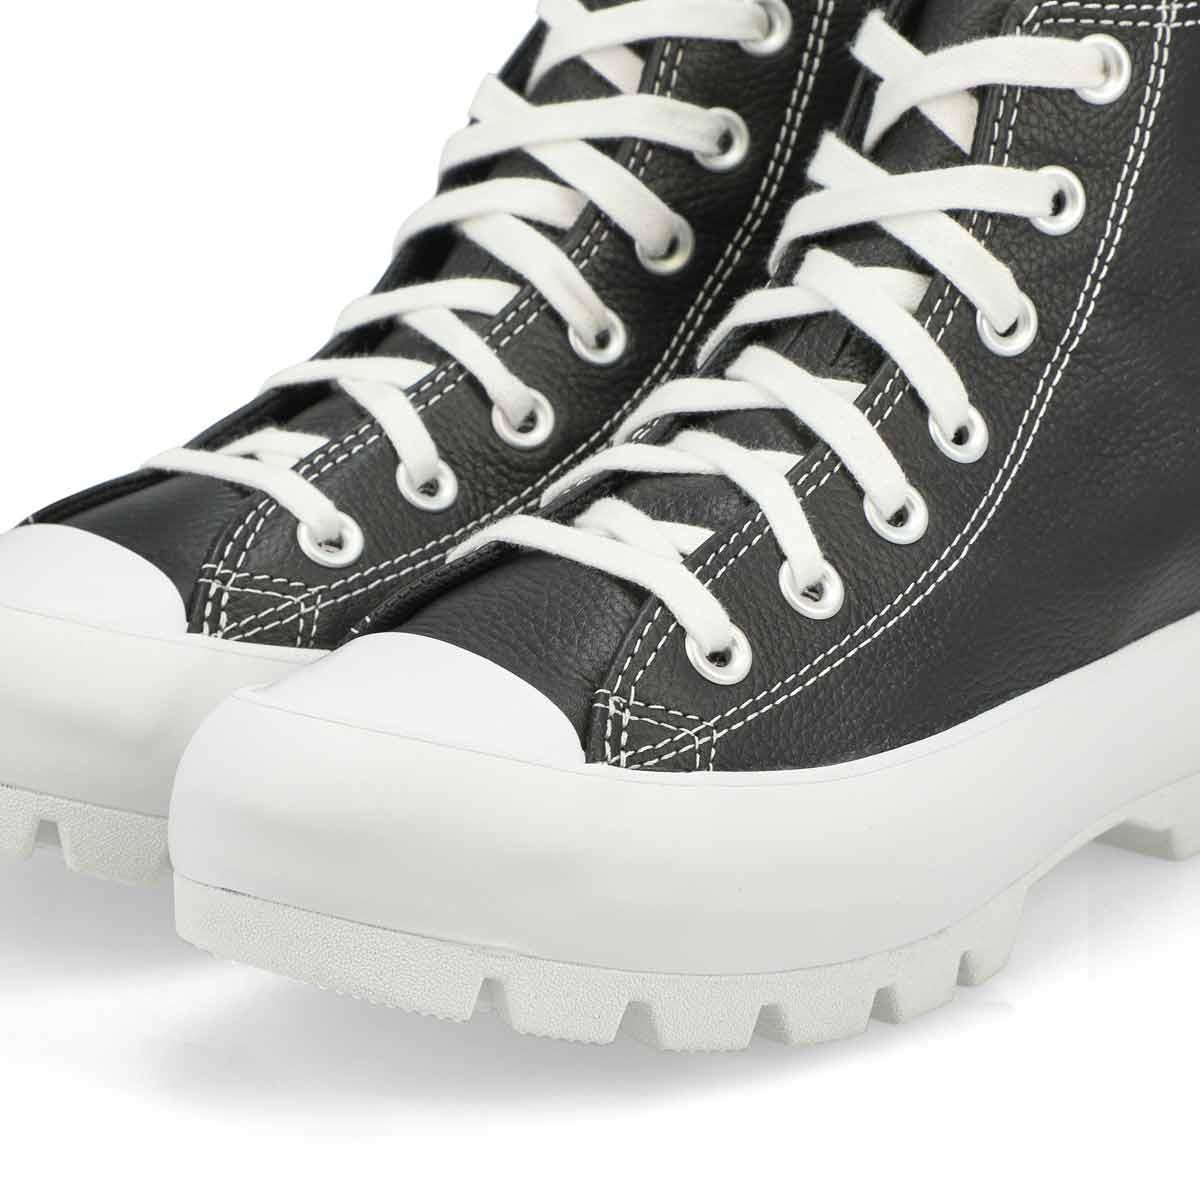 Women's All Star Lugged Hi Top Sneaker - Black